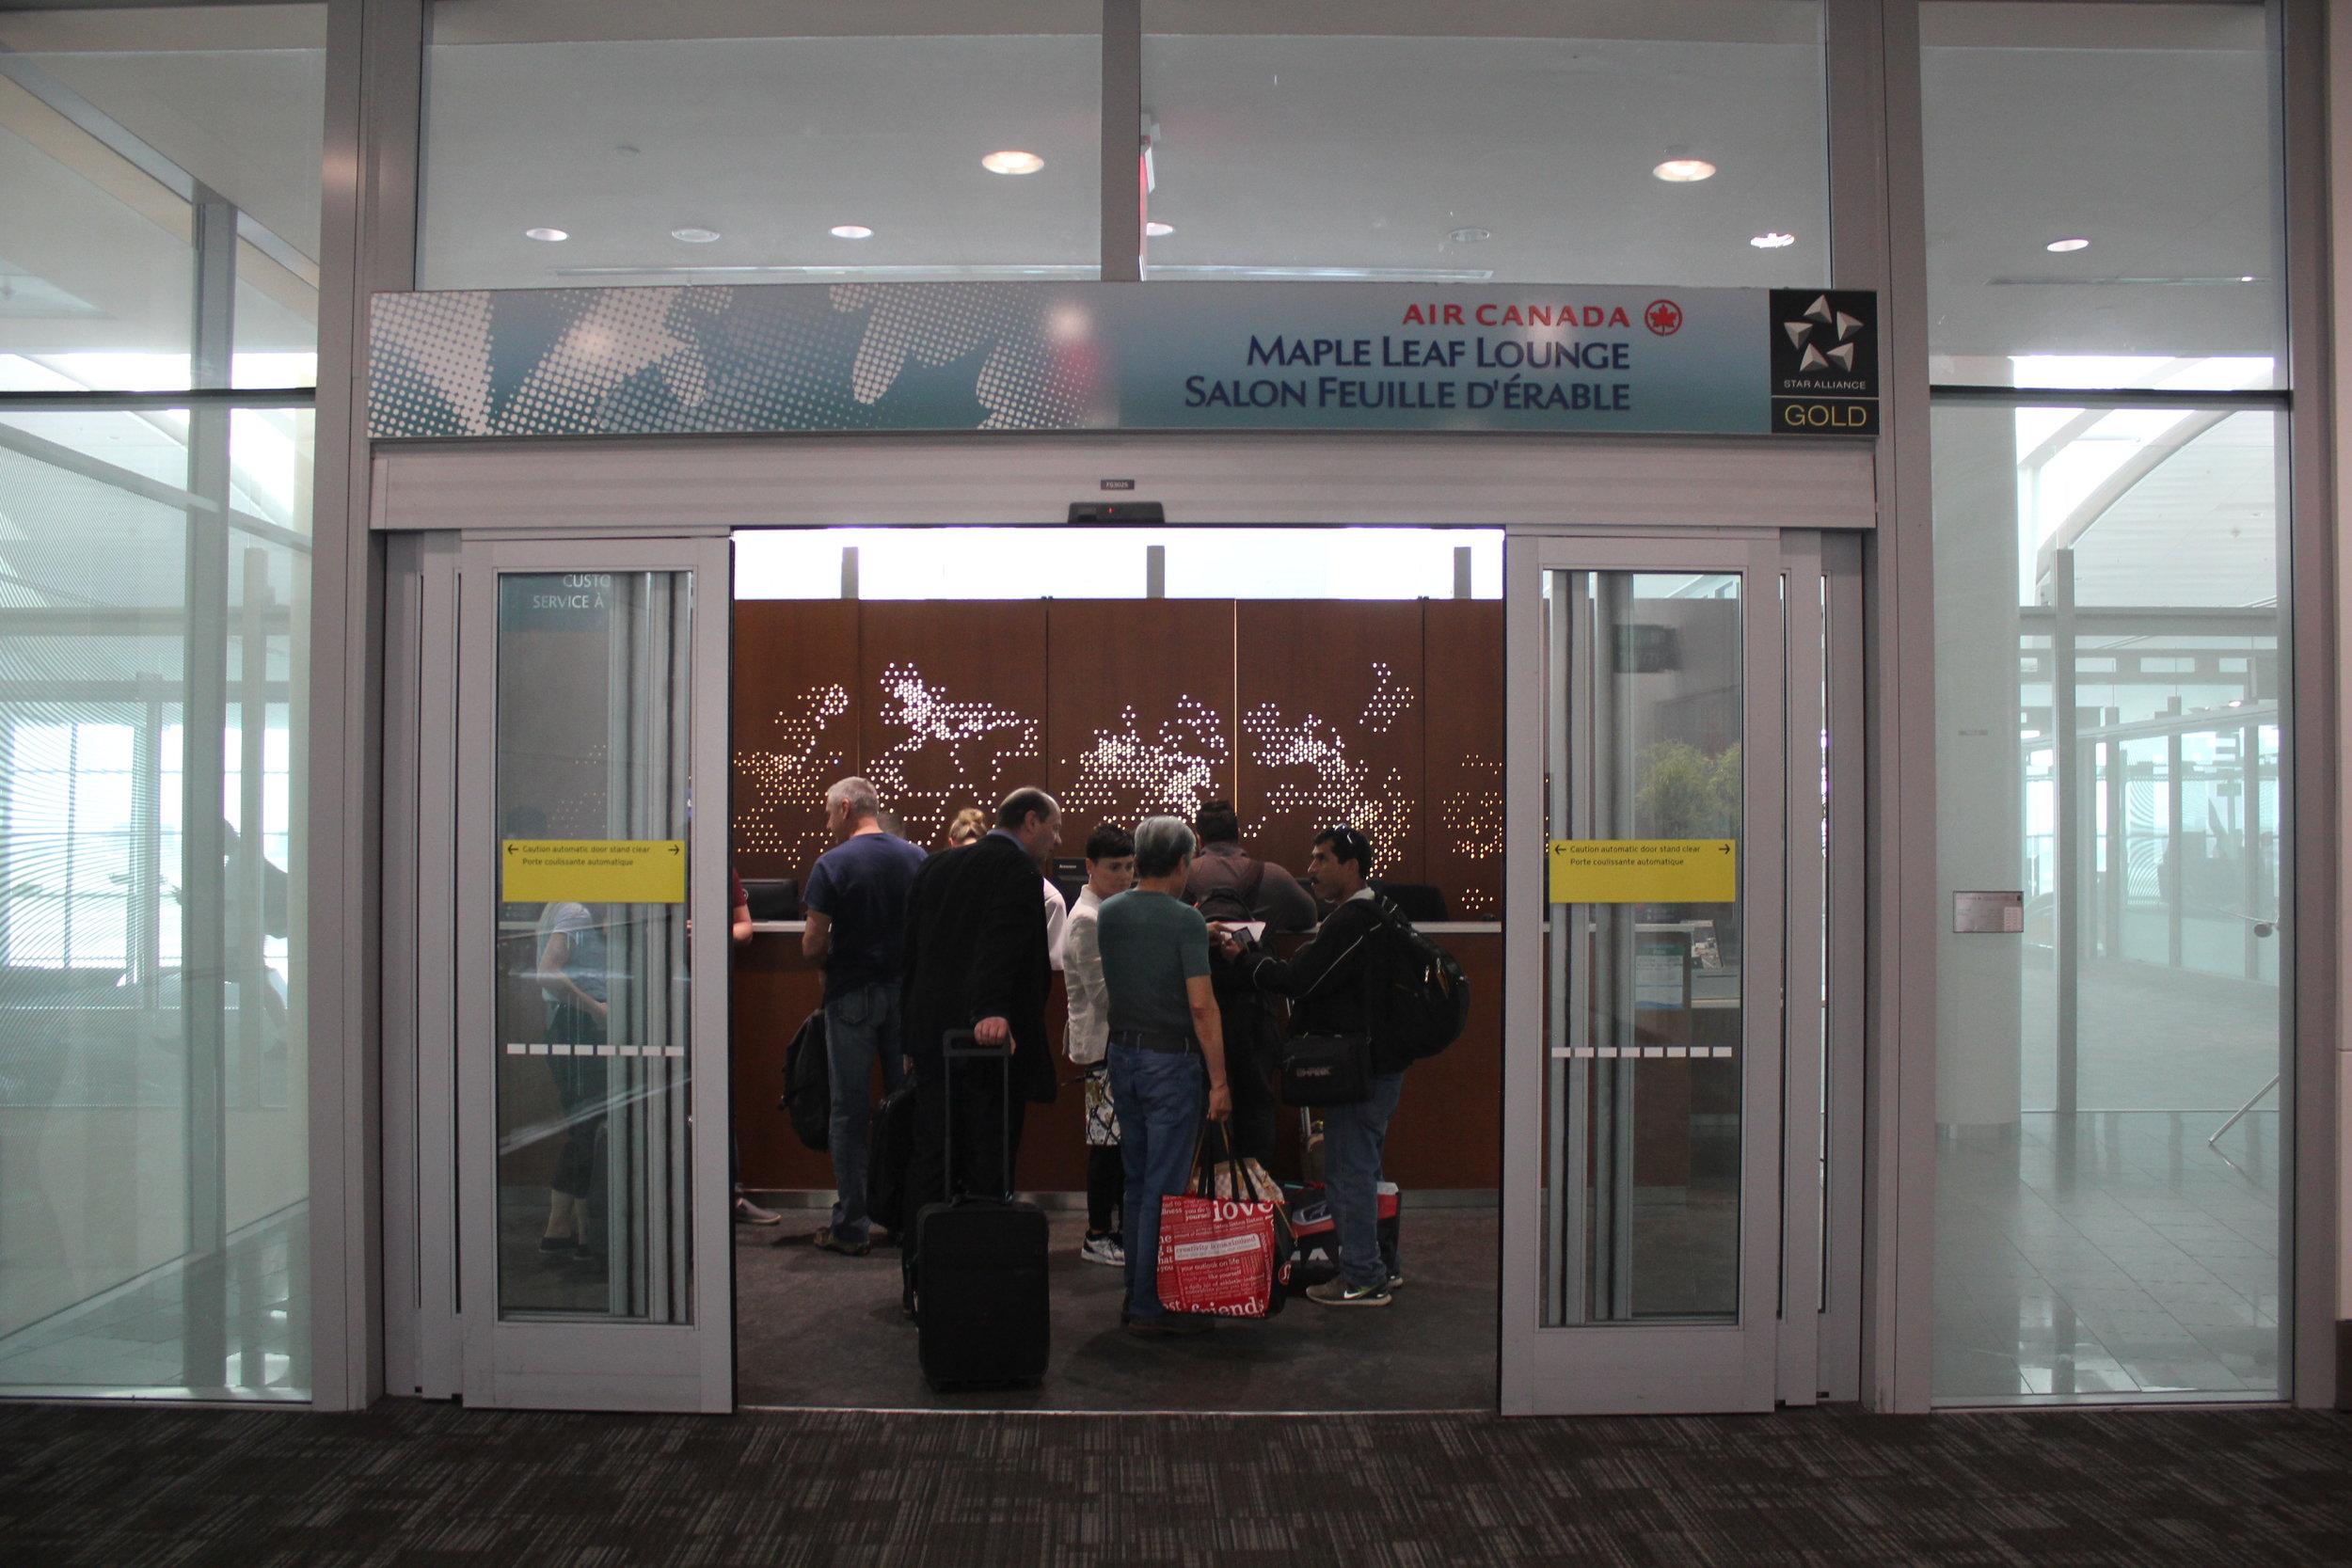 Air Canada Maple Leaf Lounge Toronto (International) – Entrance